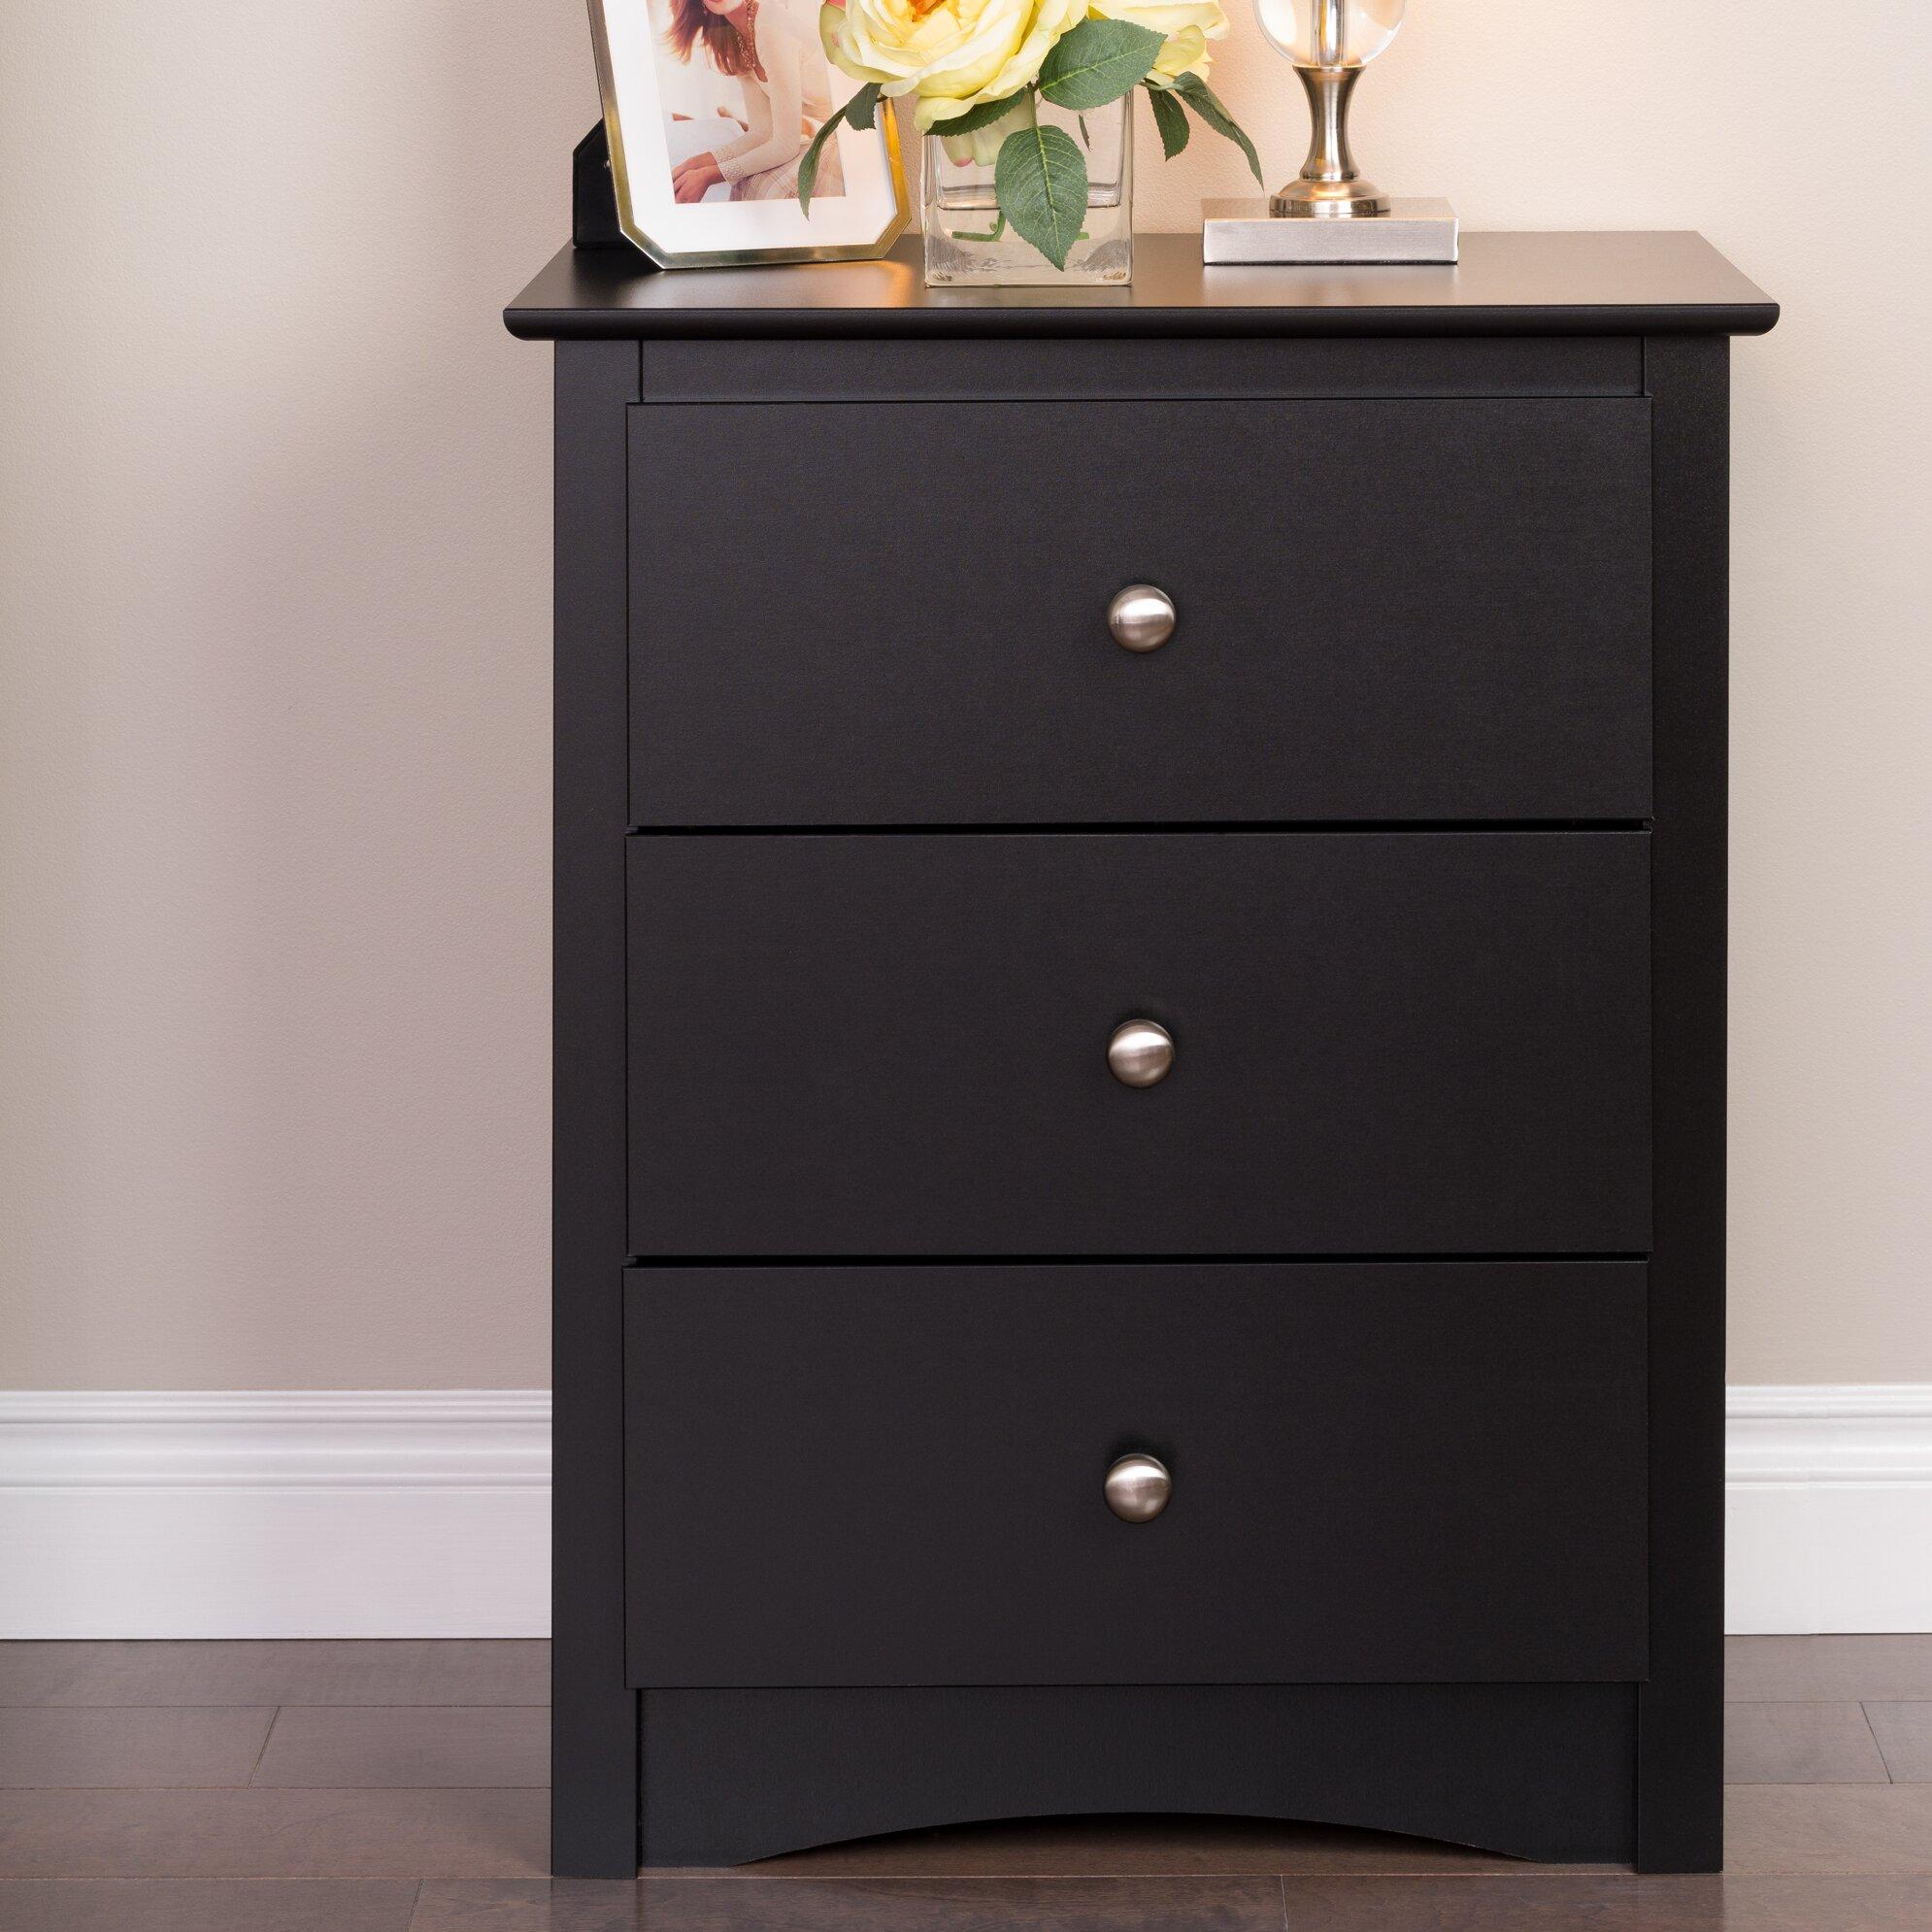 prepac sonoma tall black 3 drawer nightstand wayfair. Black Bedroom Furniture Sets. Home Design Ideas